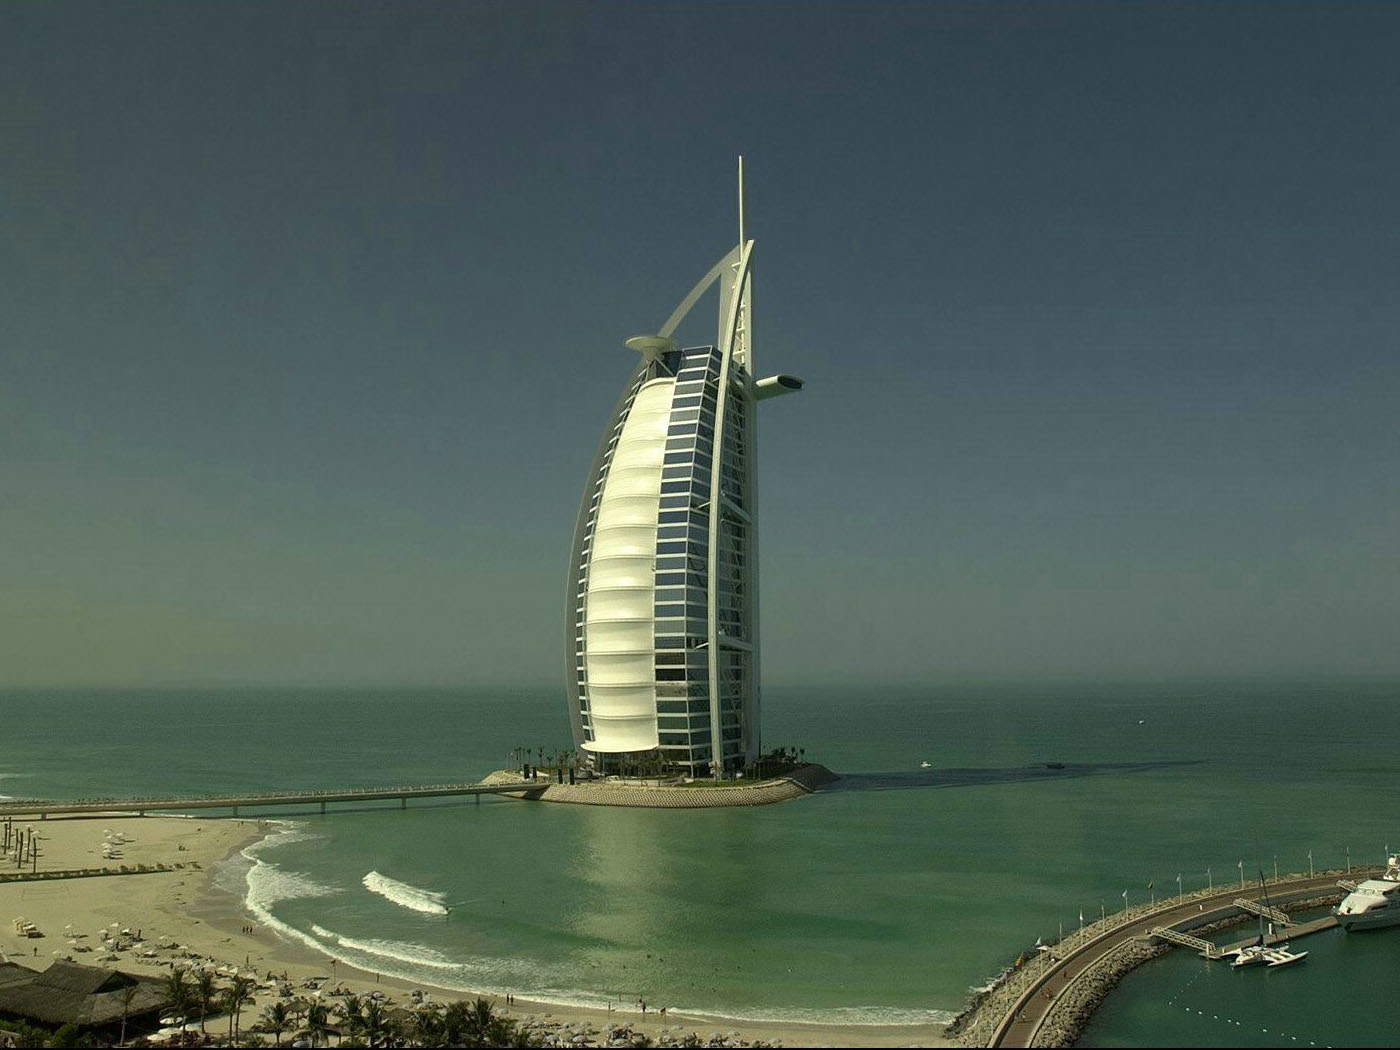 http://3.bp.blogspot.com/-hJc5IhX0dUk/TeBNYiqnBcI/AAAAAAAAEB4/IWb3KXoWWF0/s1600/Dubai-The-Bur-Jal-Arab-Tower-1-1400x1050.jpg